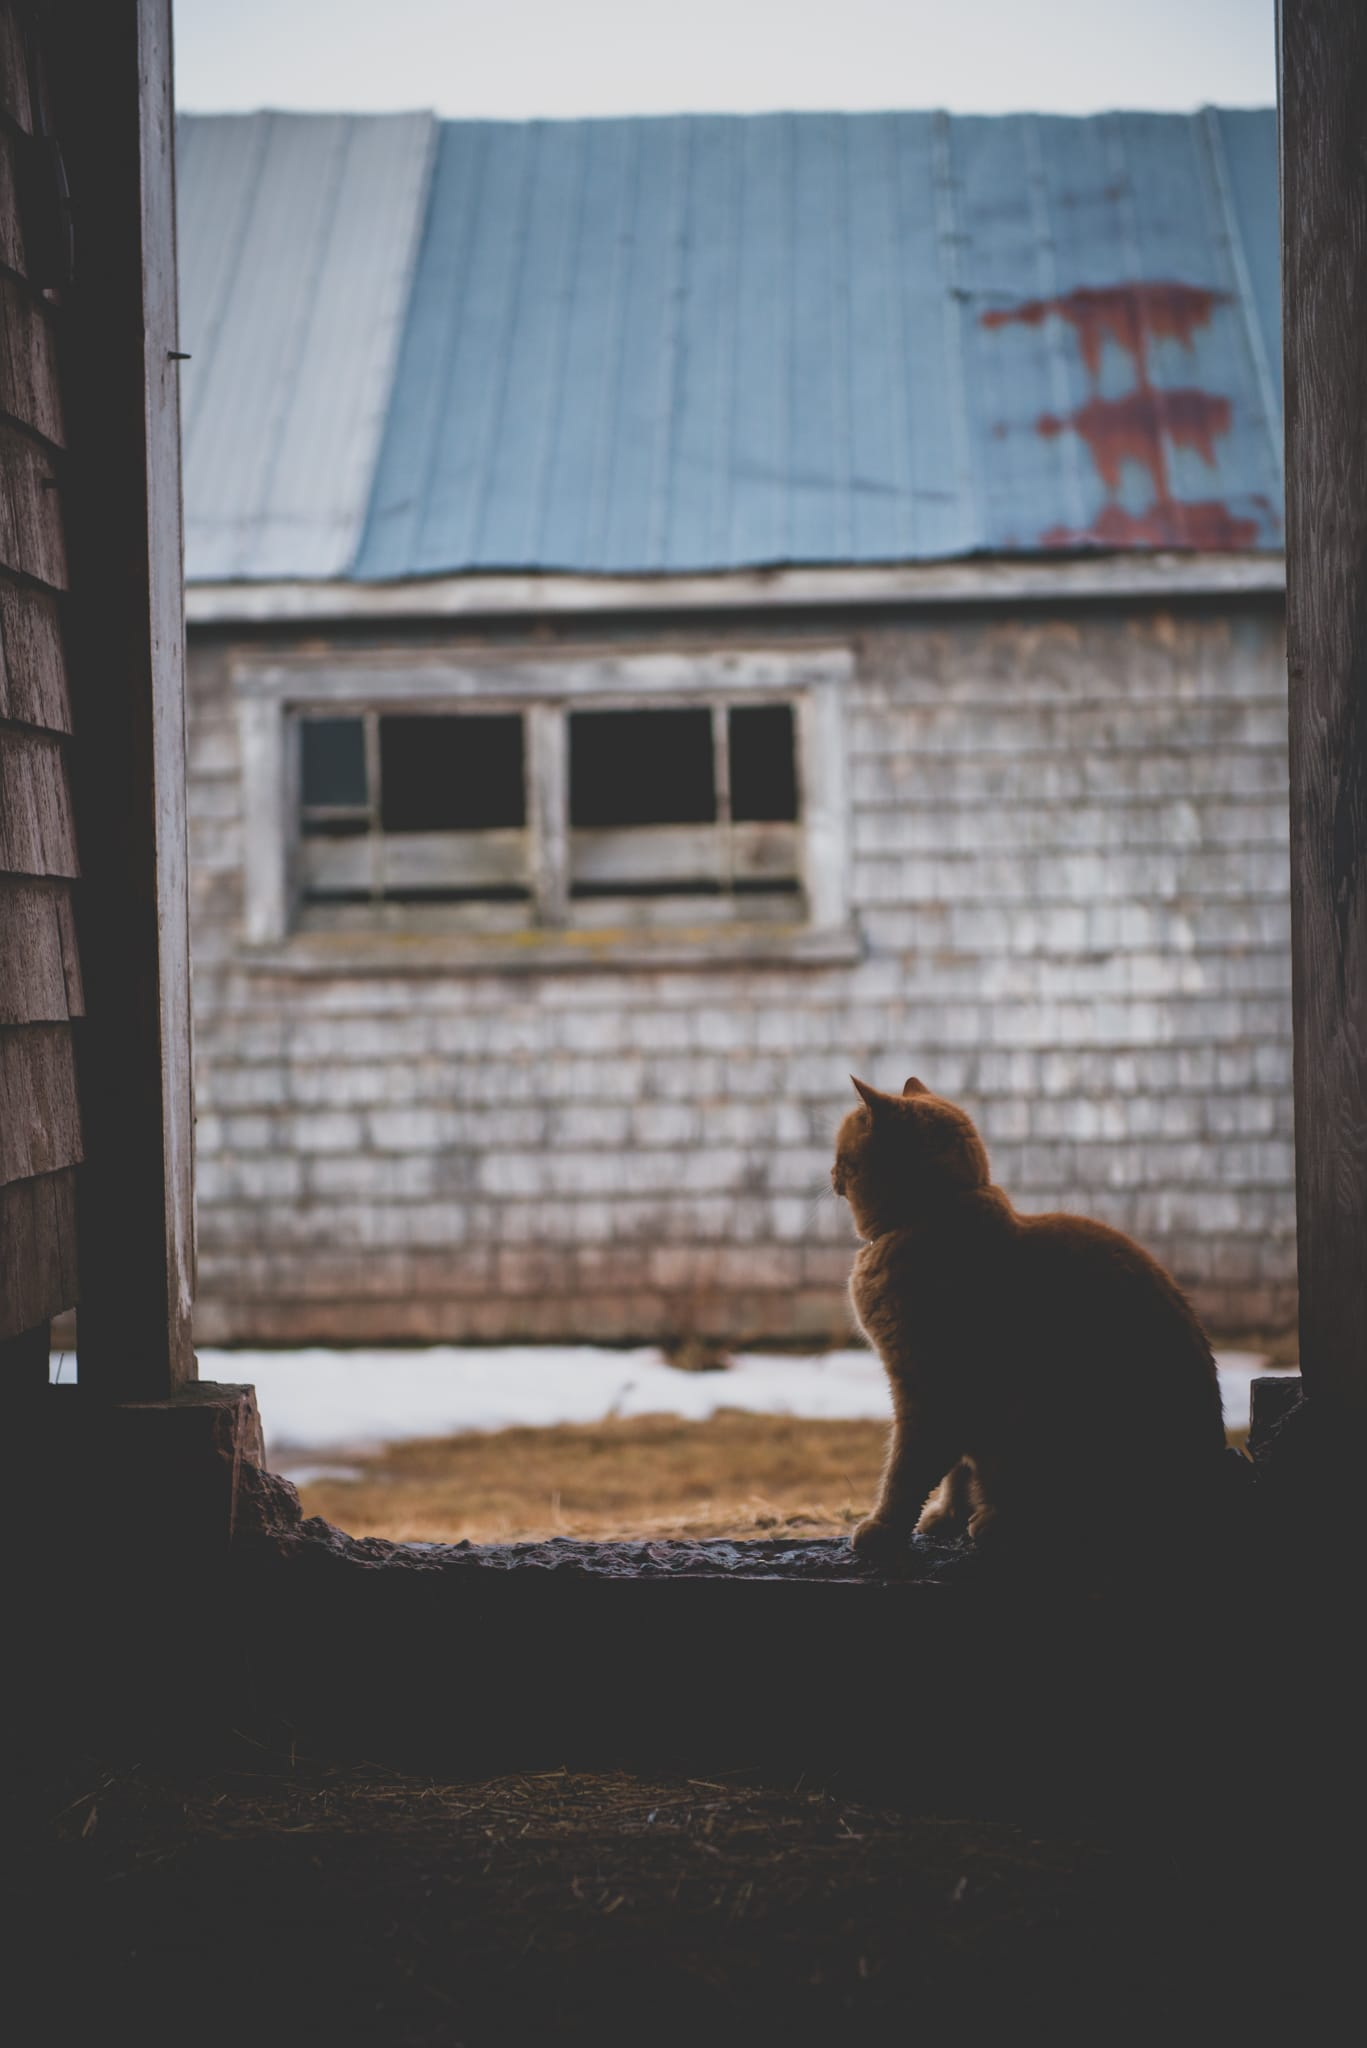 foggy farm with cat in barn door